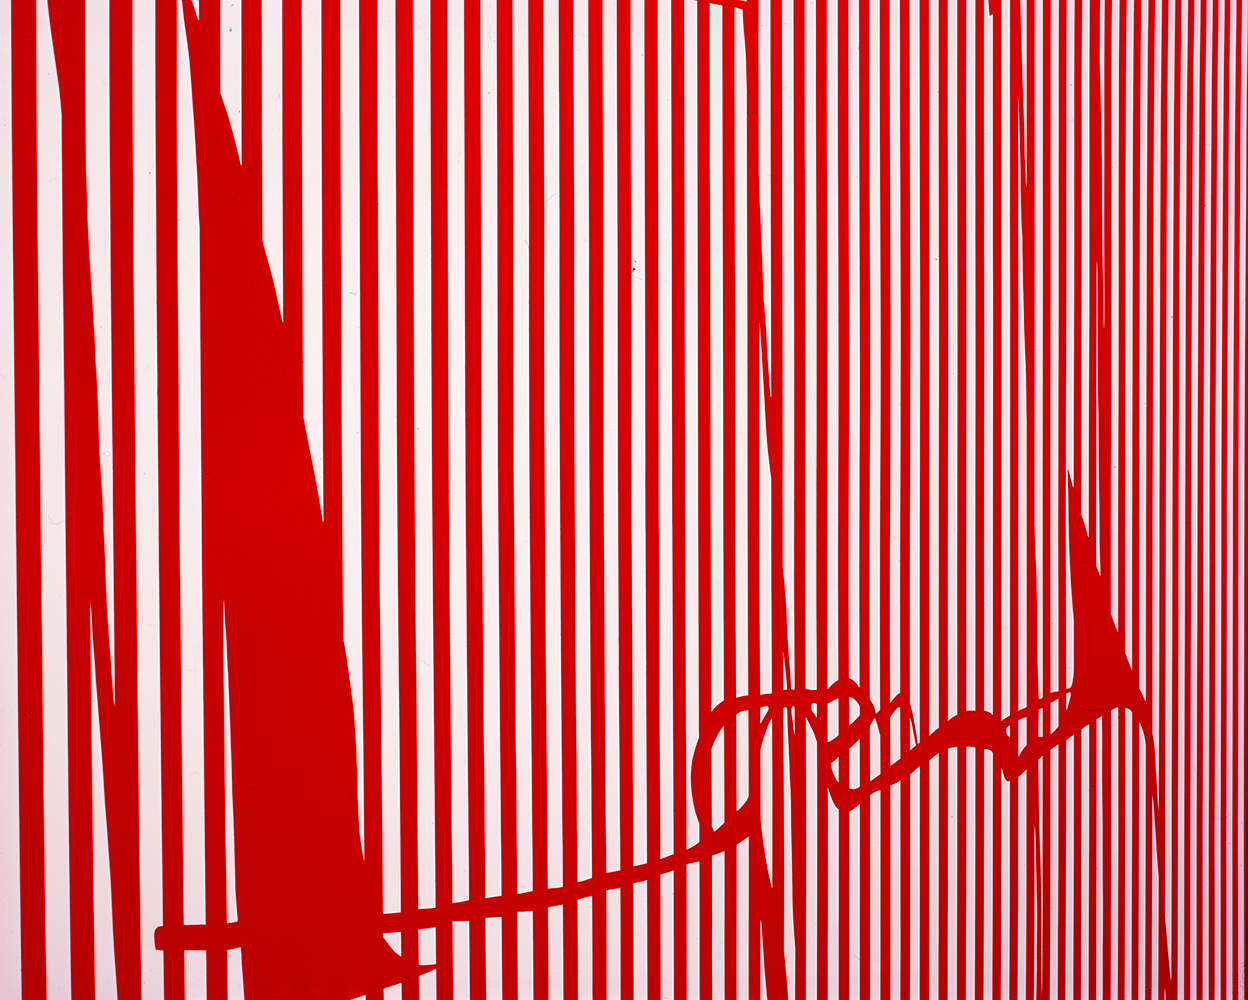 Getrennt, aber doch zusammen, 2005, Acrylic paint on prepared wall, Variable, DAAD Galerie, Berlin